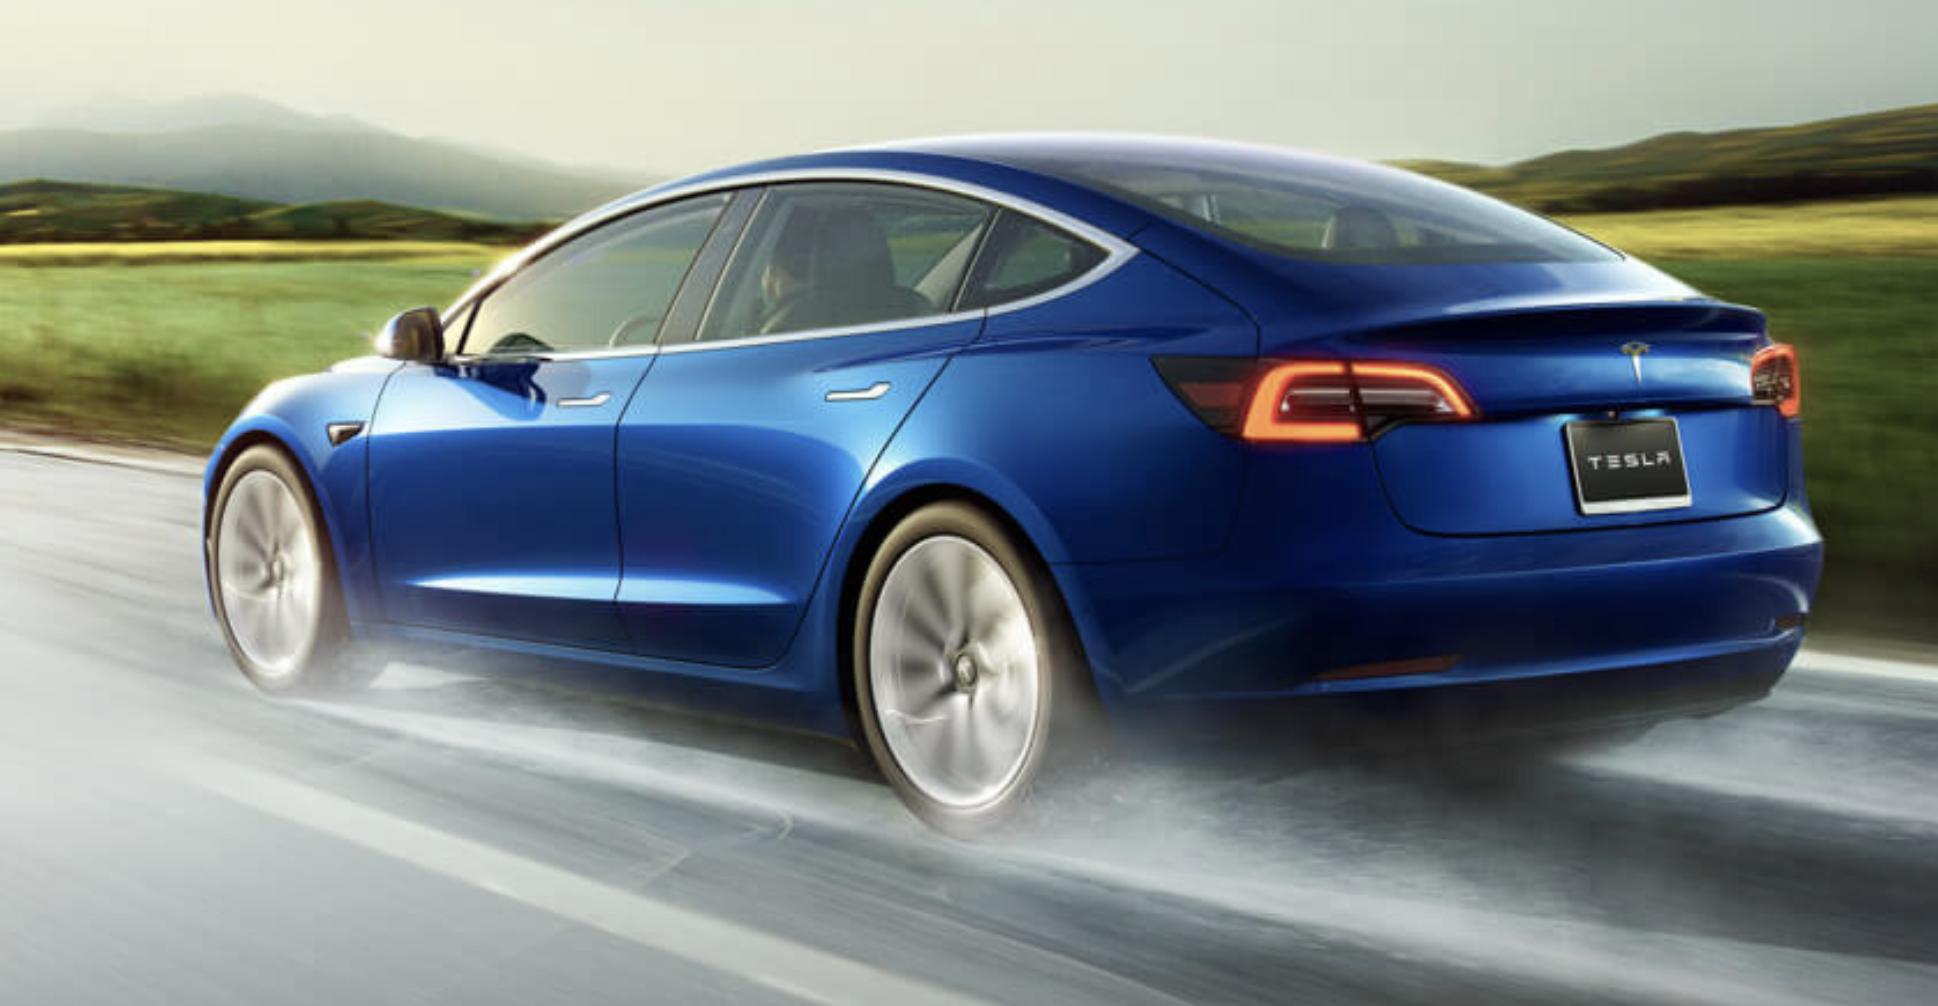 Tesla Model 3 Long Range - 322 miles, $46,990 - mediafeed